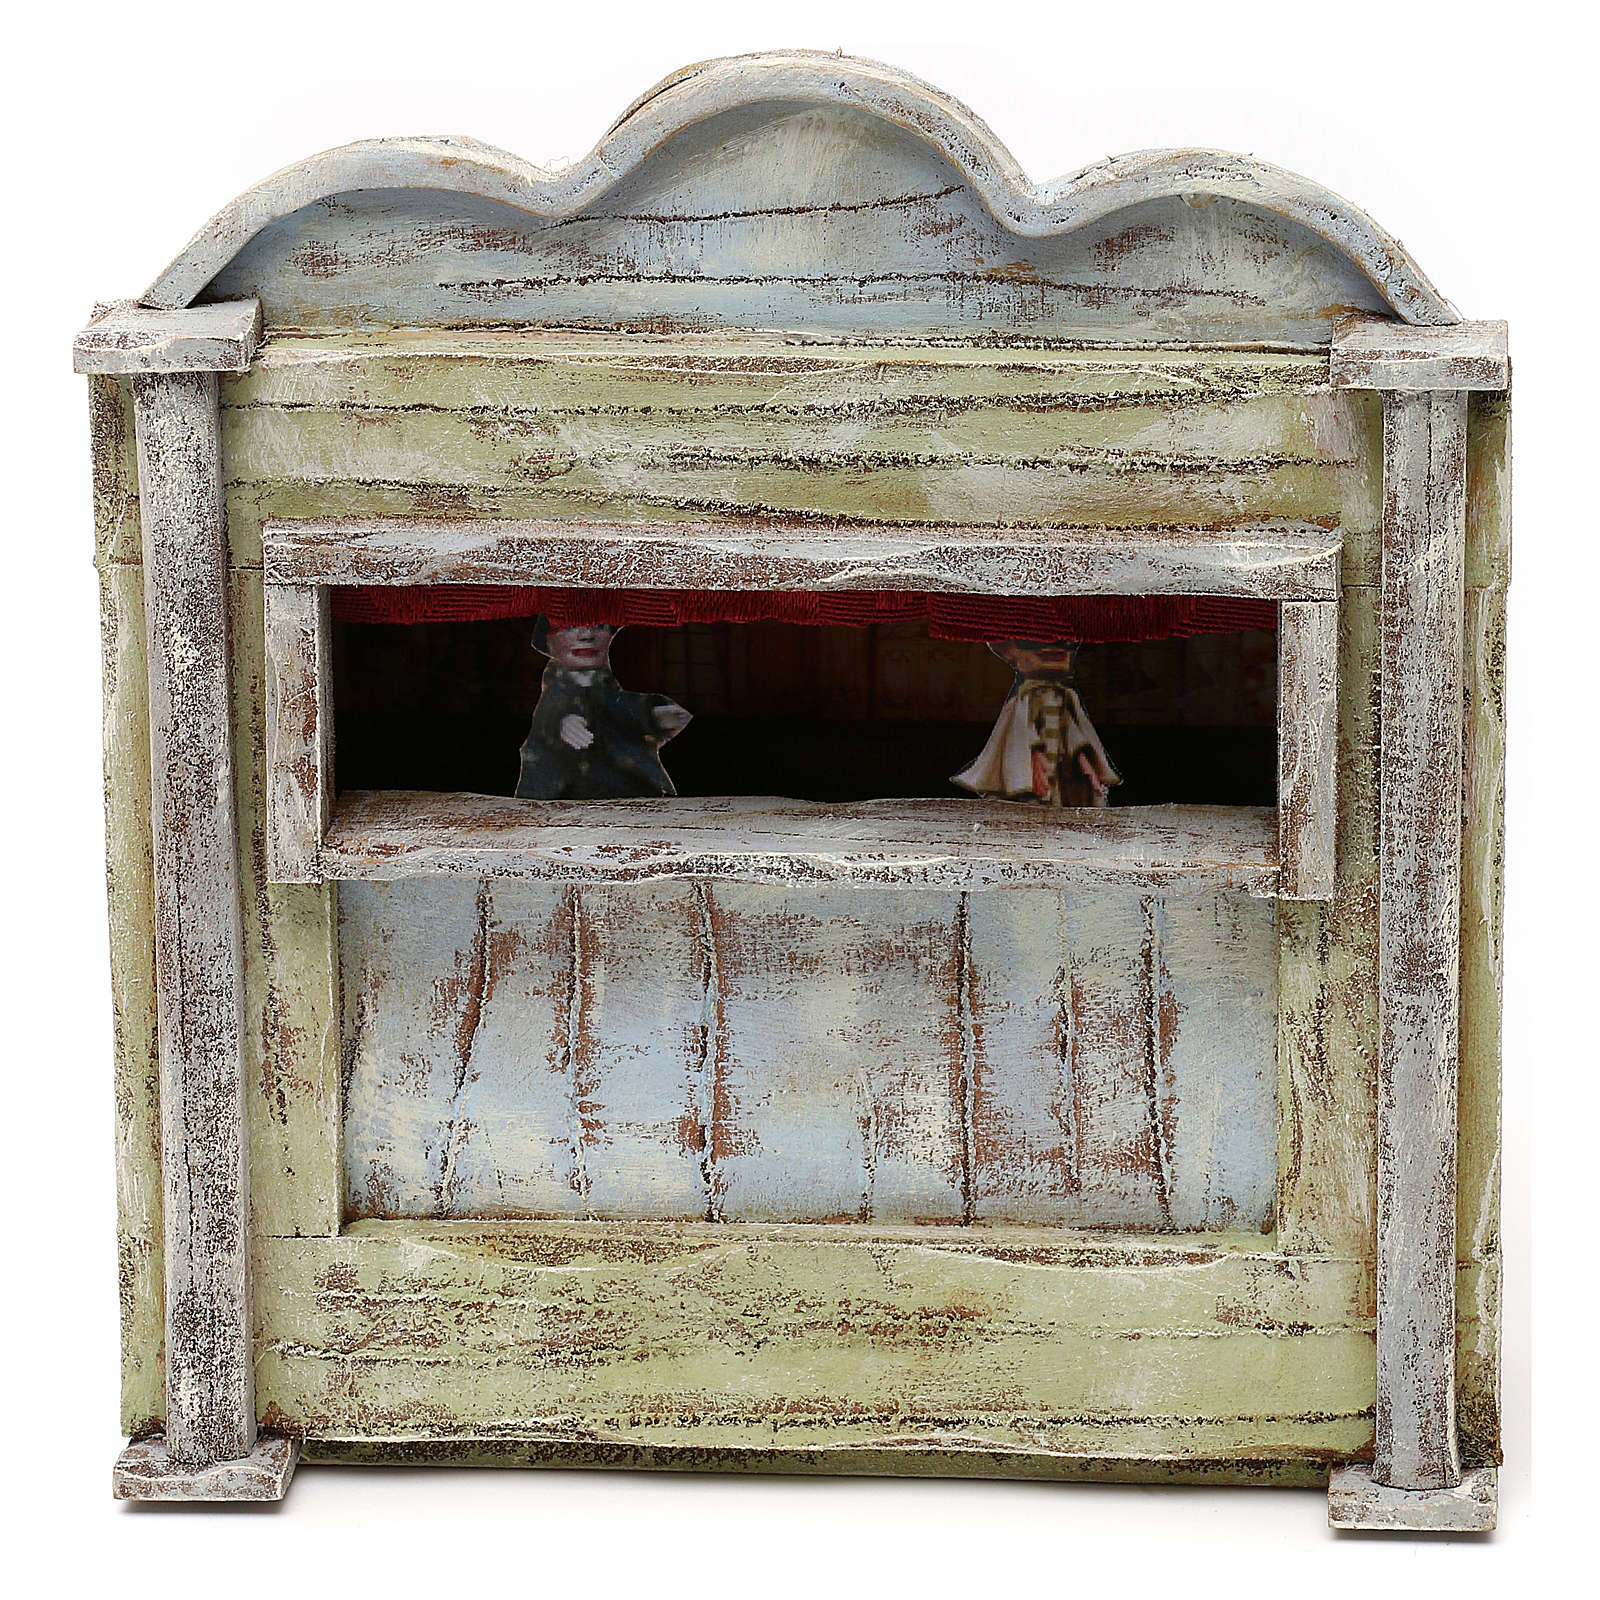 Teatro de madera belén 10 cm 20x15x5 cm 4